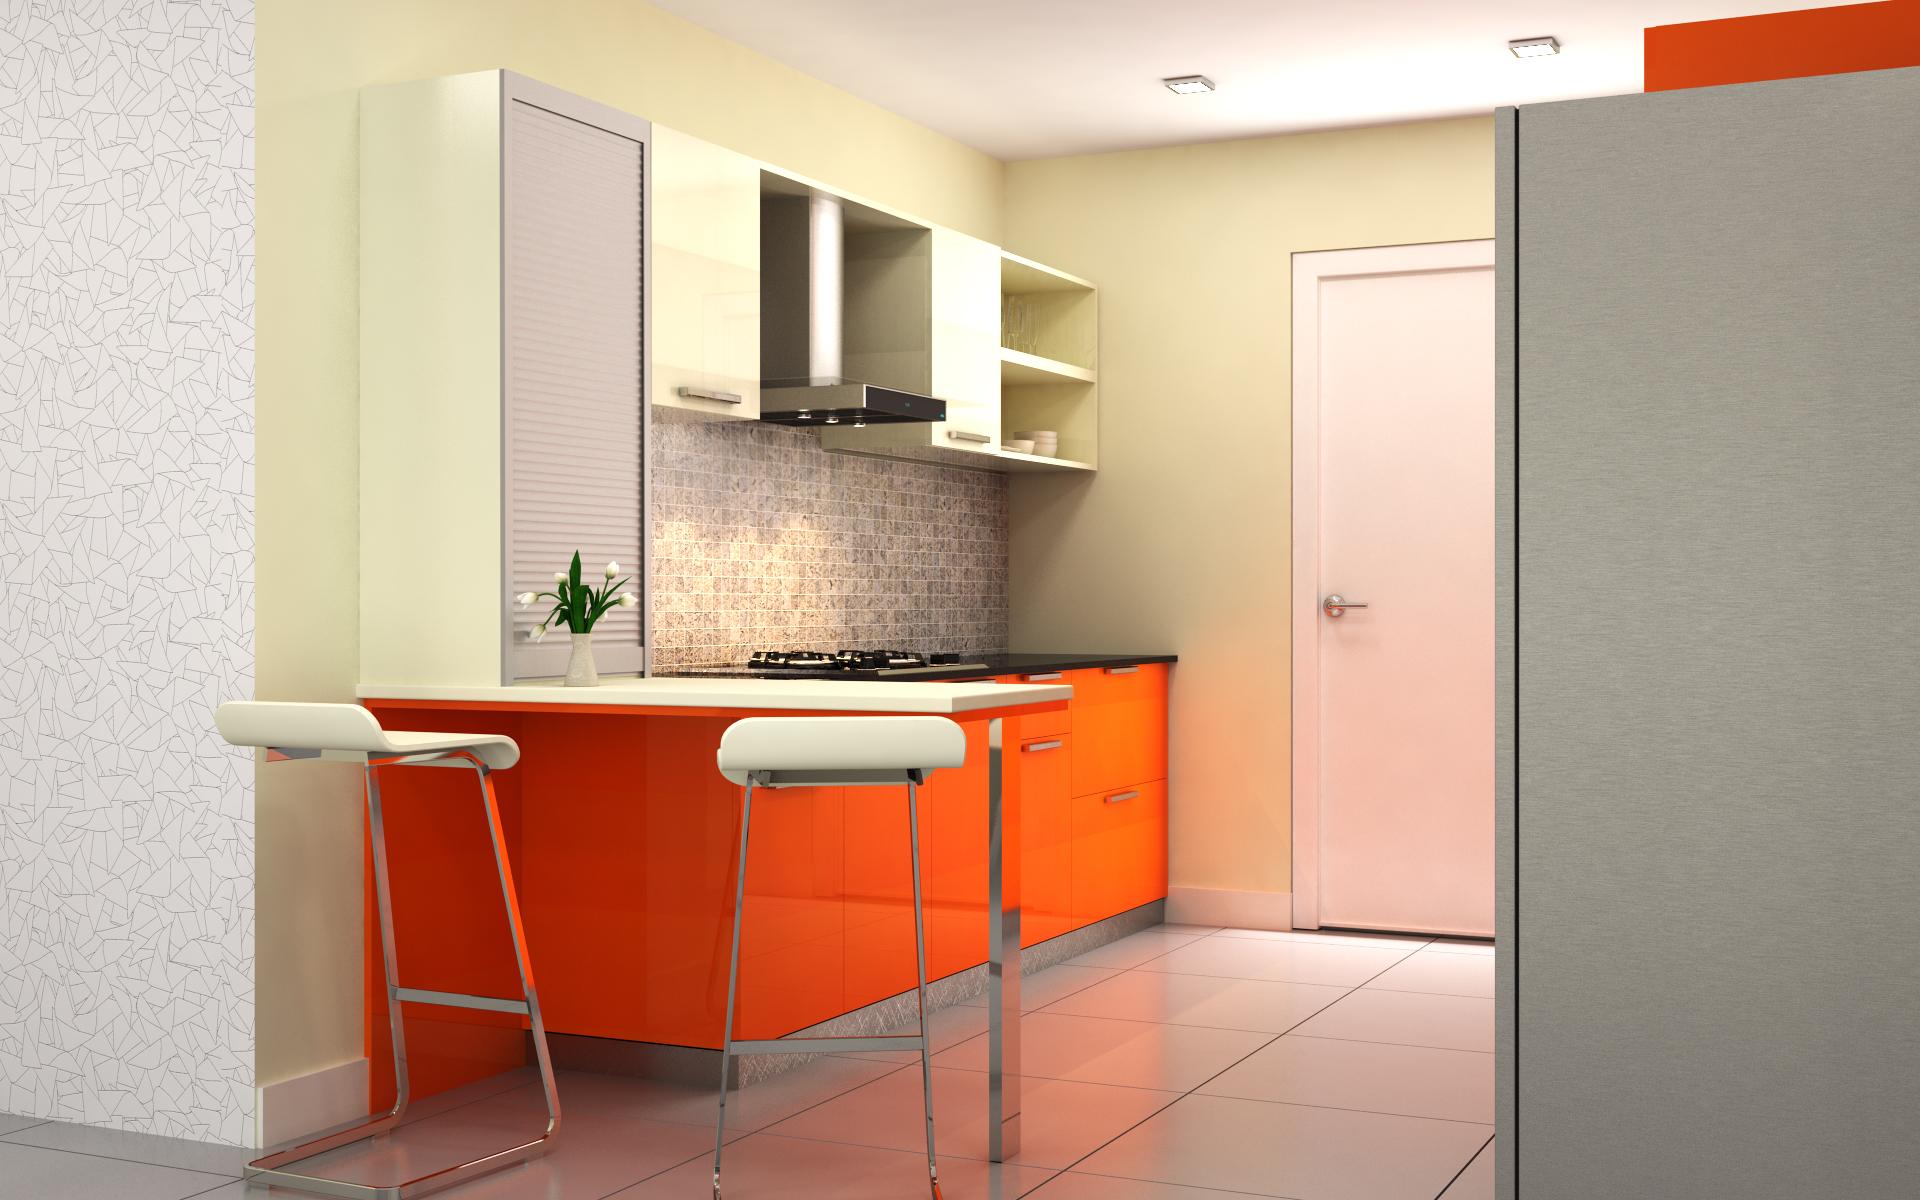 1 bhk flat interior design india - Buy Modular Latest Budget Kitchens Online India Homelane Com Condor Urban Parallel Kitchen